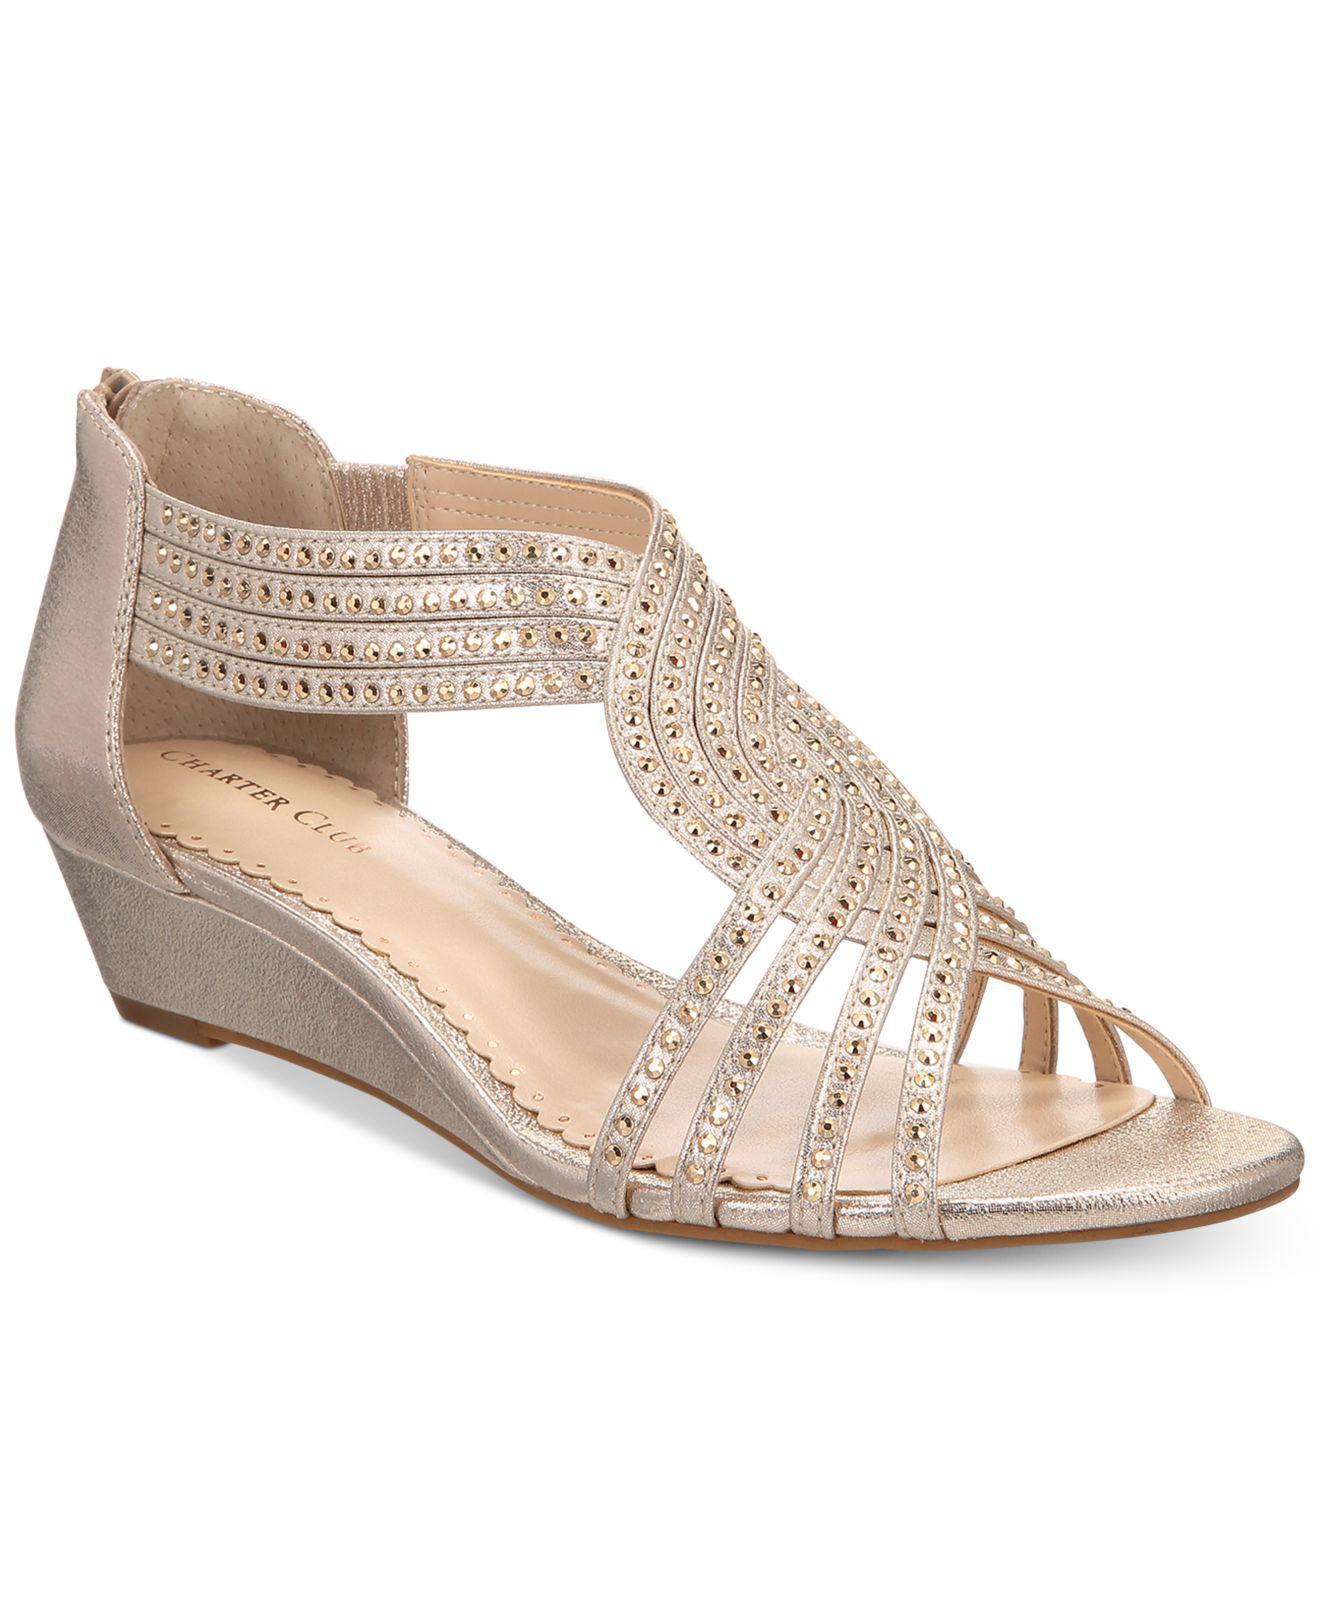 3ccd06d7b575 Lyst - Charter Club Ginifur Wedge Sandals